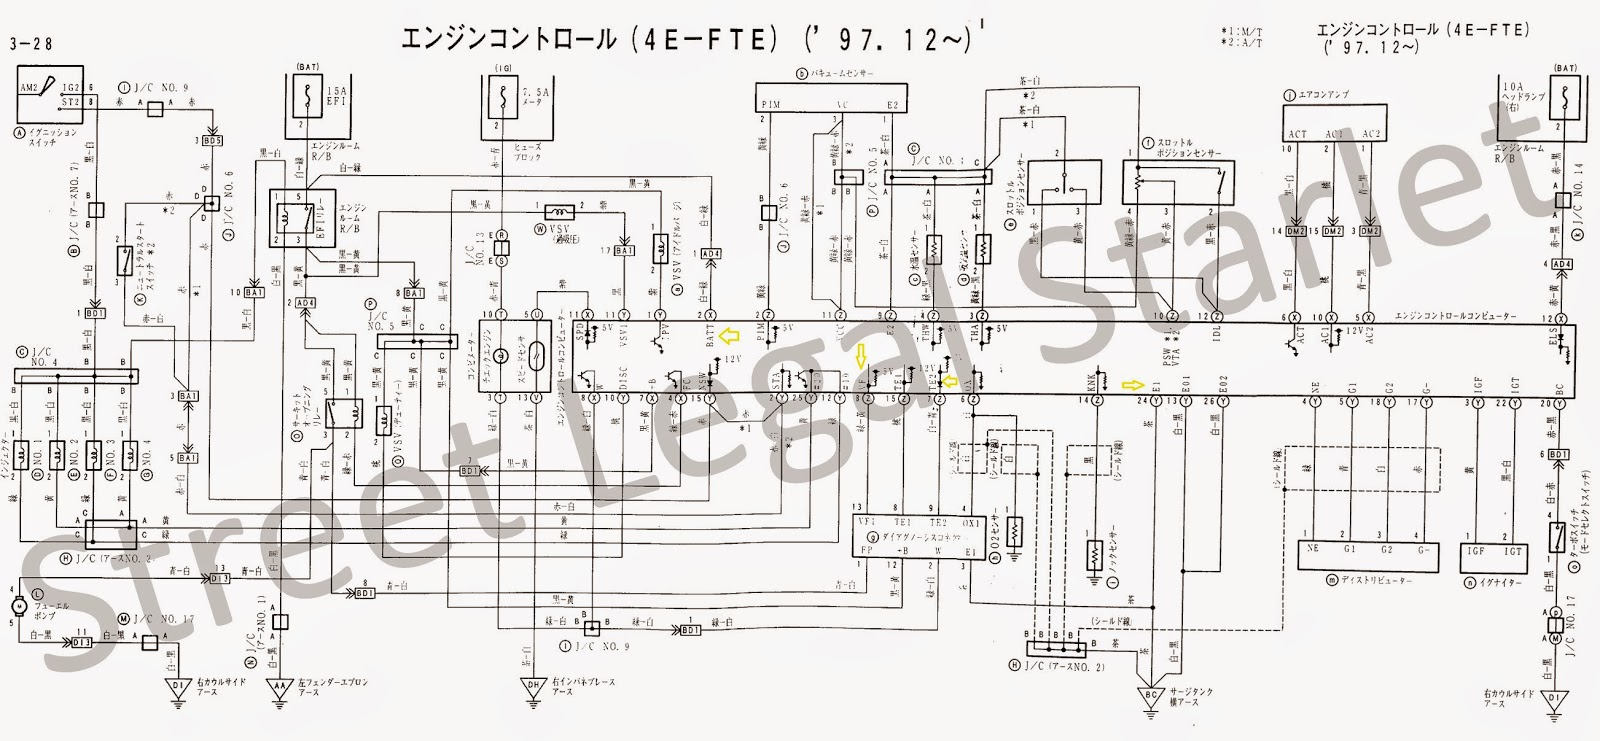 toyota starlet wiring diagram free download wiring diagrams rh 2 fjdfjl franconianhorsecoaching de